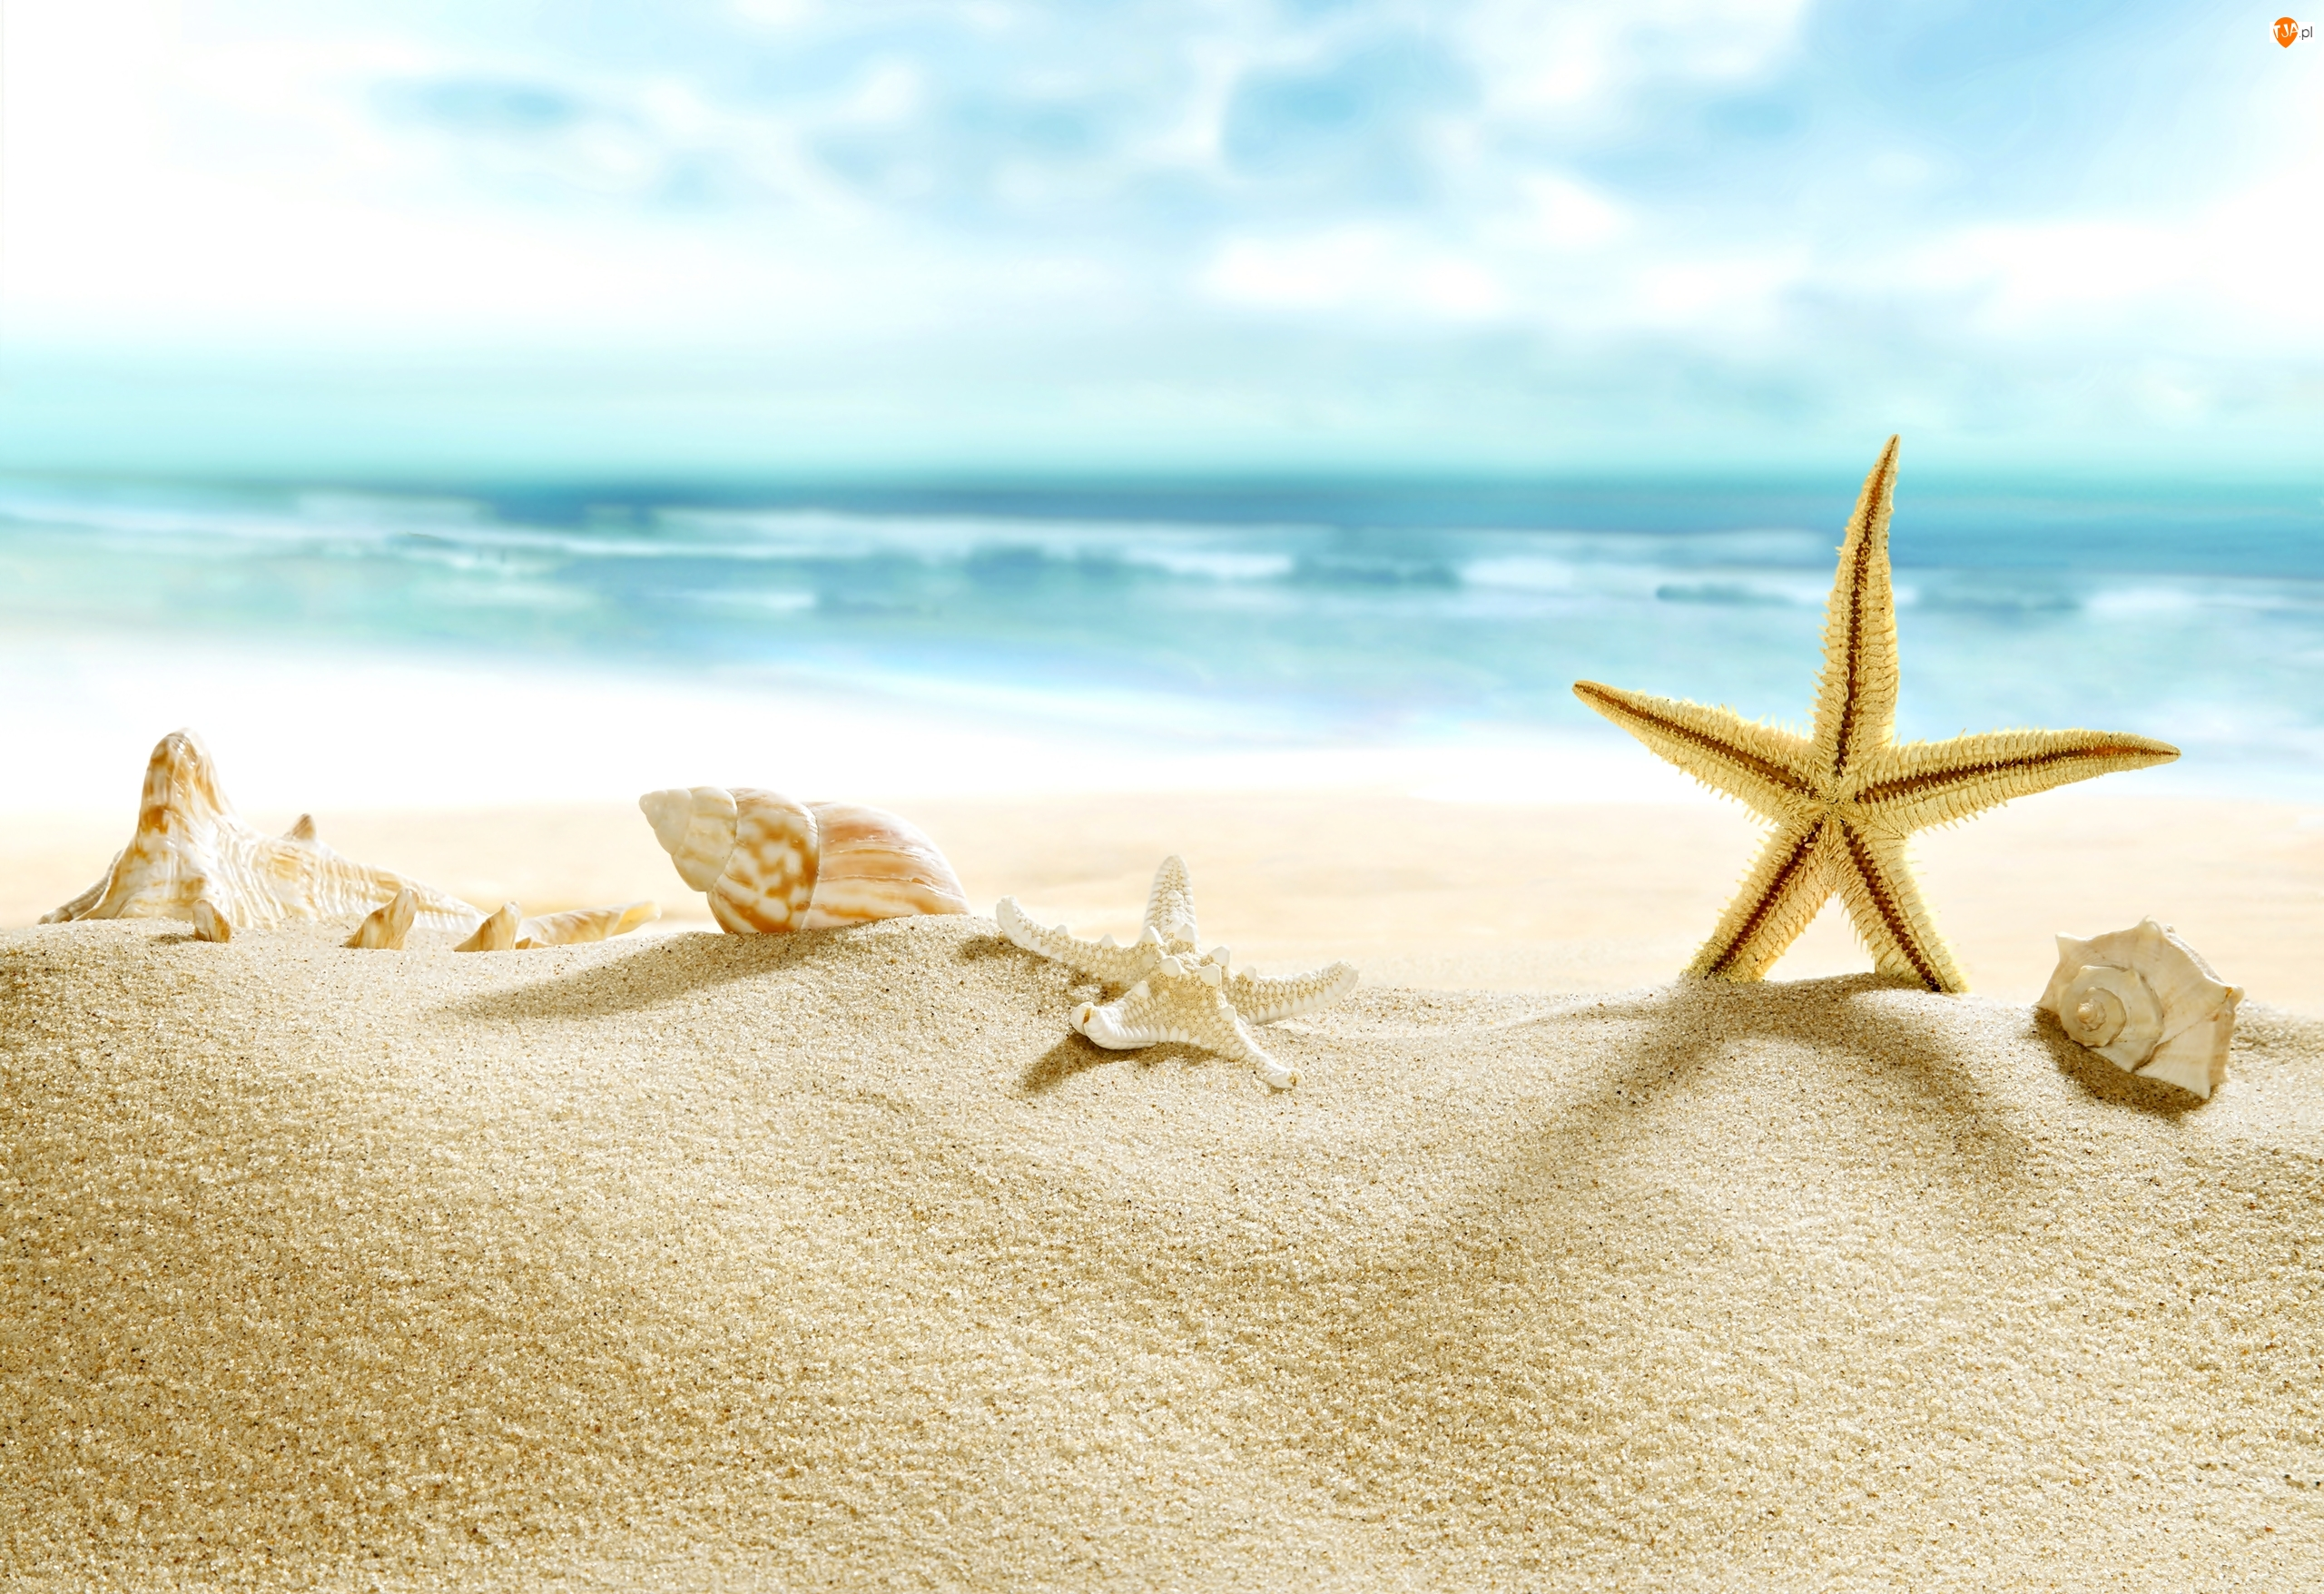 Rozgwiazda, Lato, Morze, Plaża, Muszle